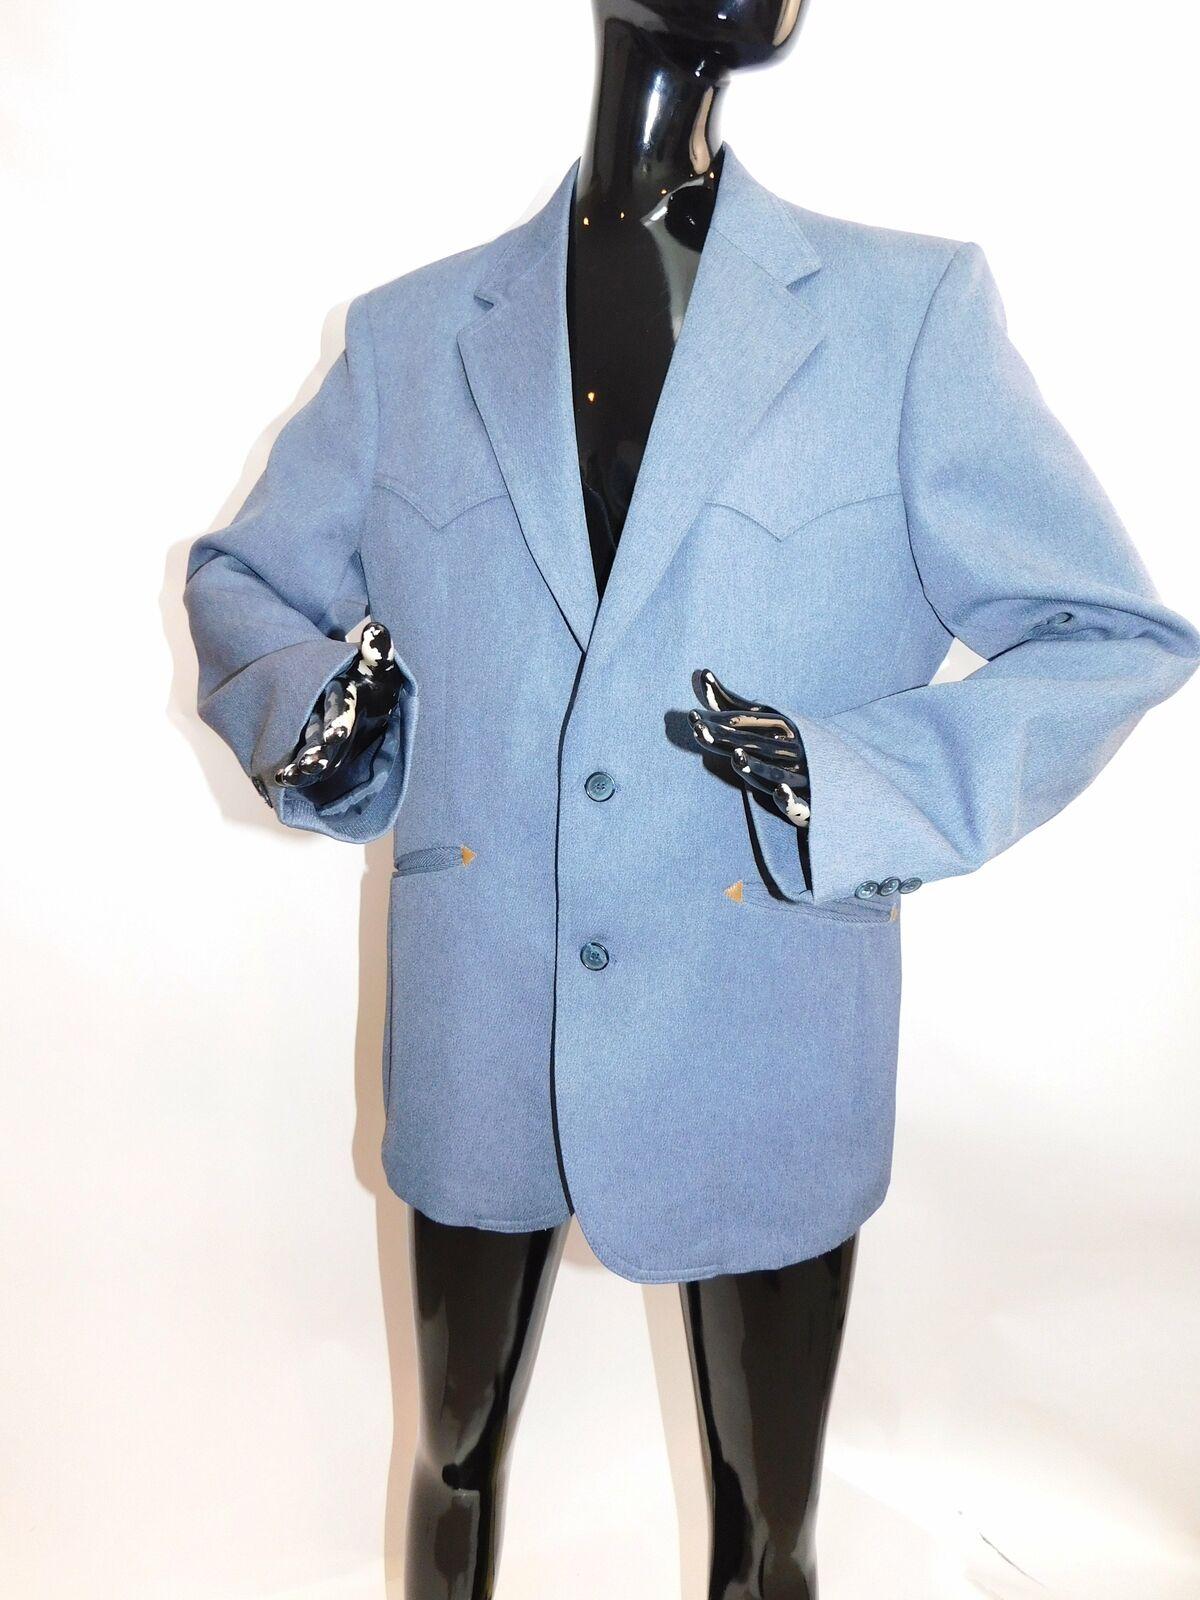 Vintage 1970s Western suit jacket by Levis - image 3